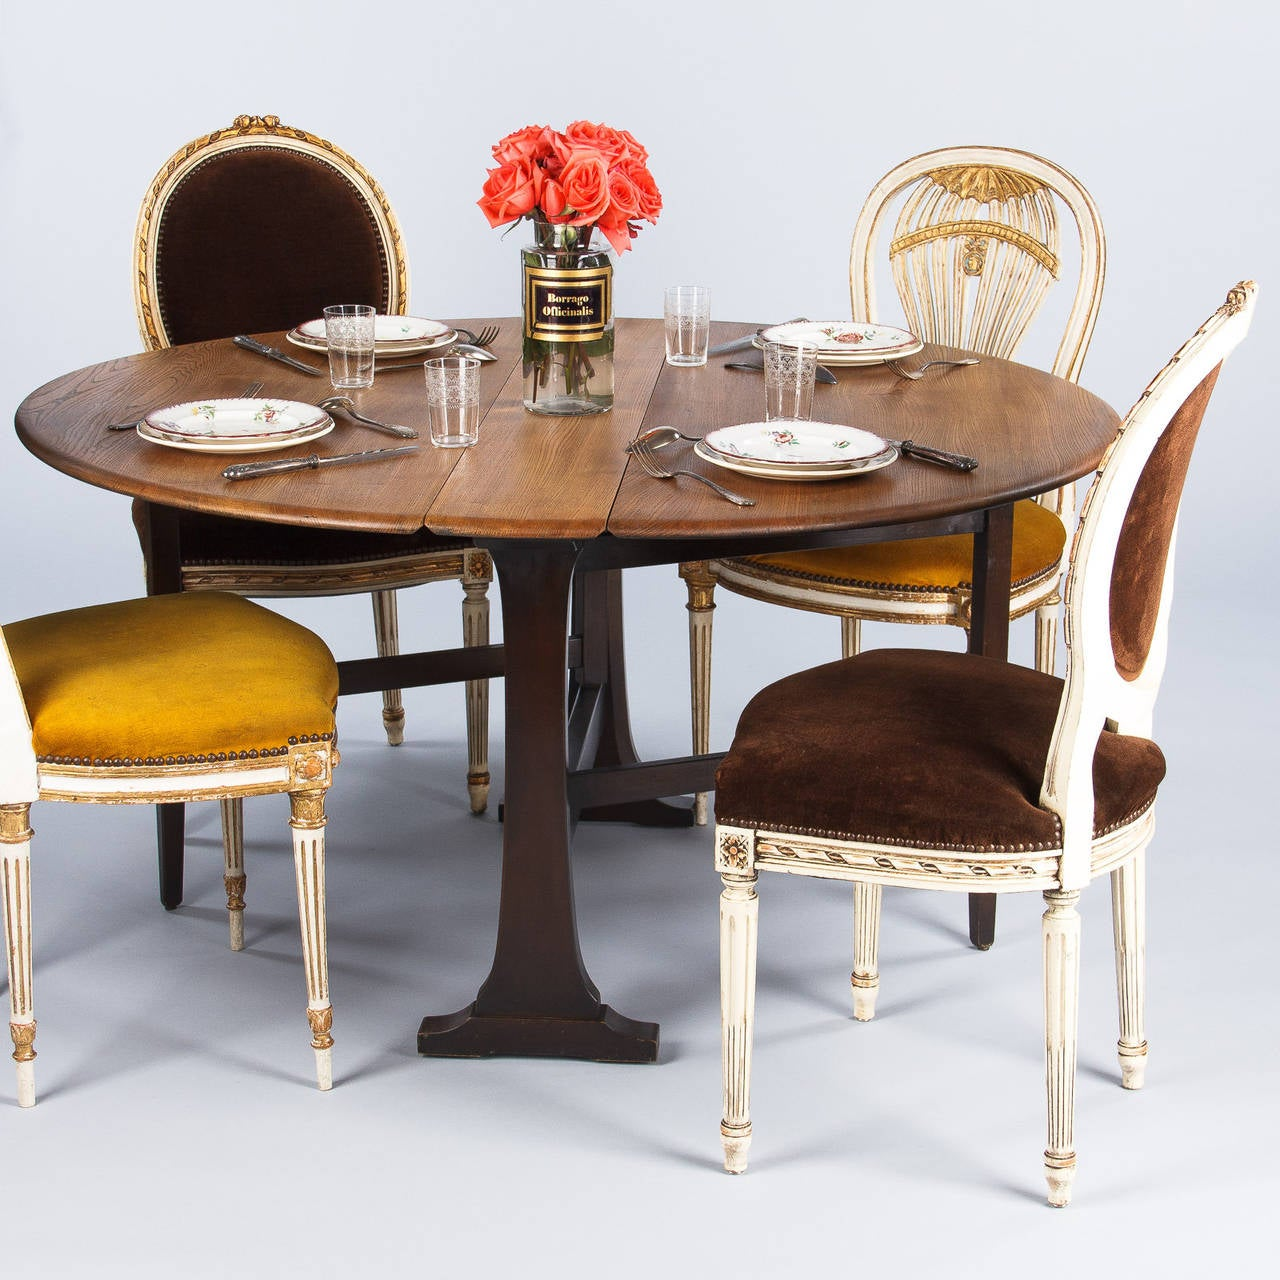 Midcentury Oak Gateleg Table by Ercol England at 1stdibs